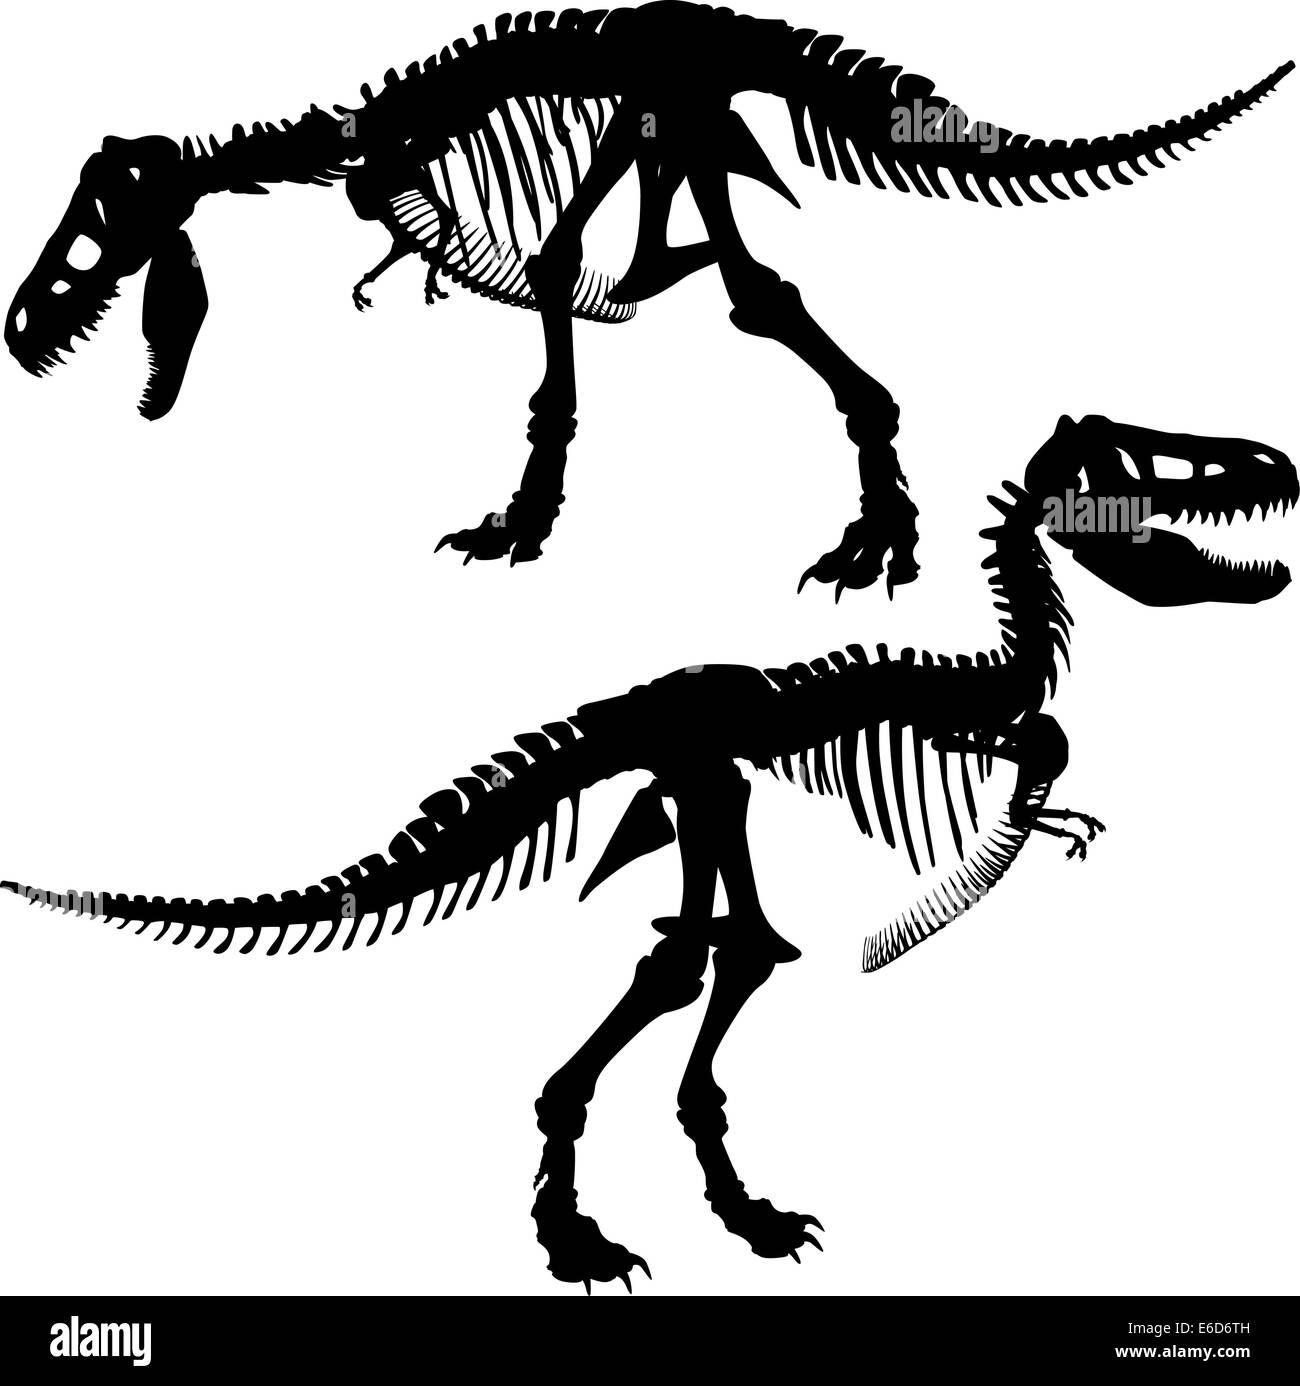 Editable vector silhouettes of the skeleton of a Tyrannosaurus rex dinosaur - Stock Image